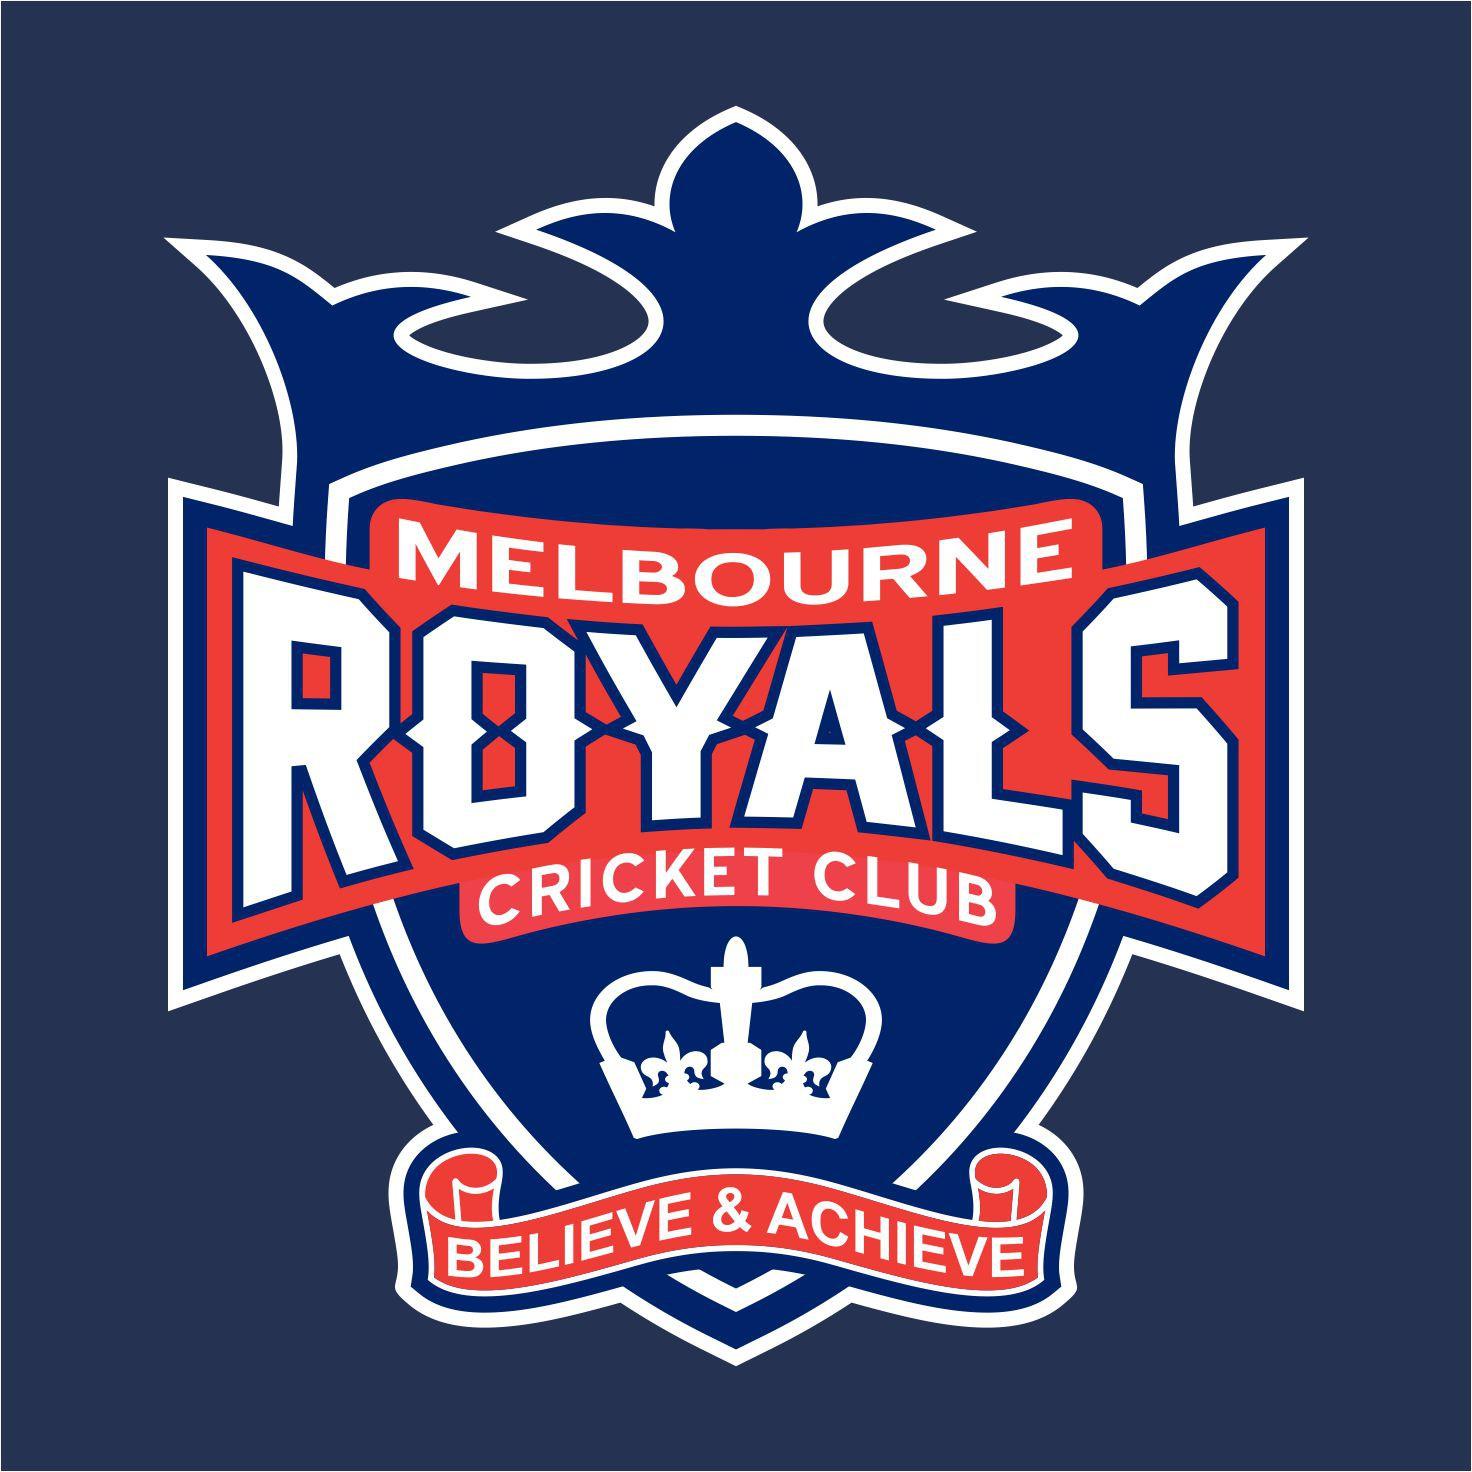 logo for Melbourne Royals Cricket Club